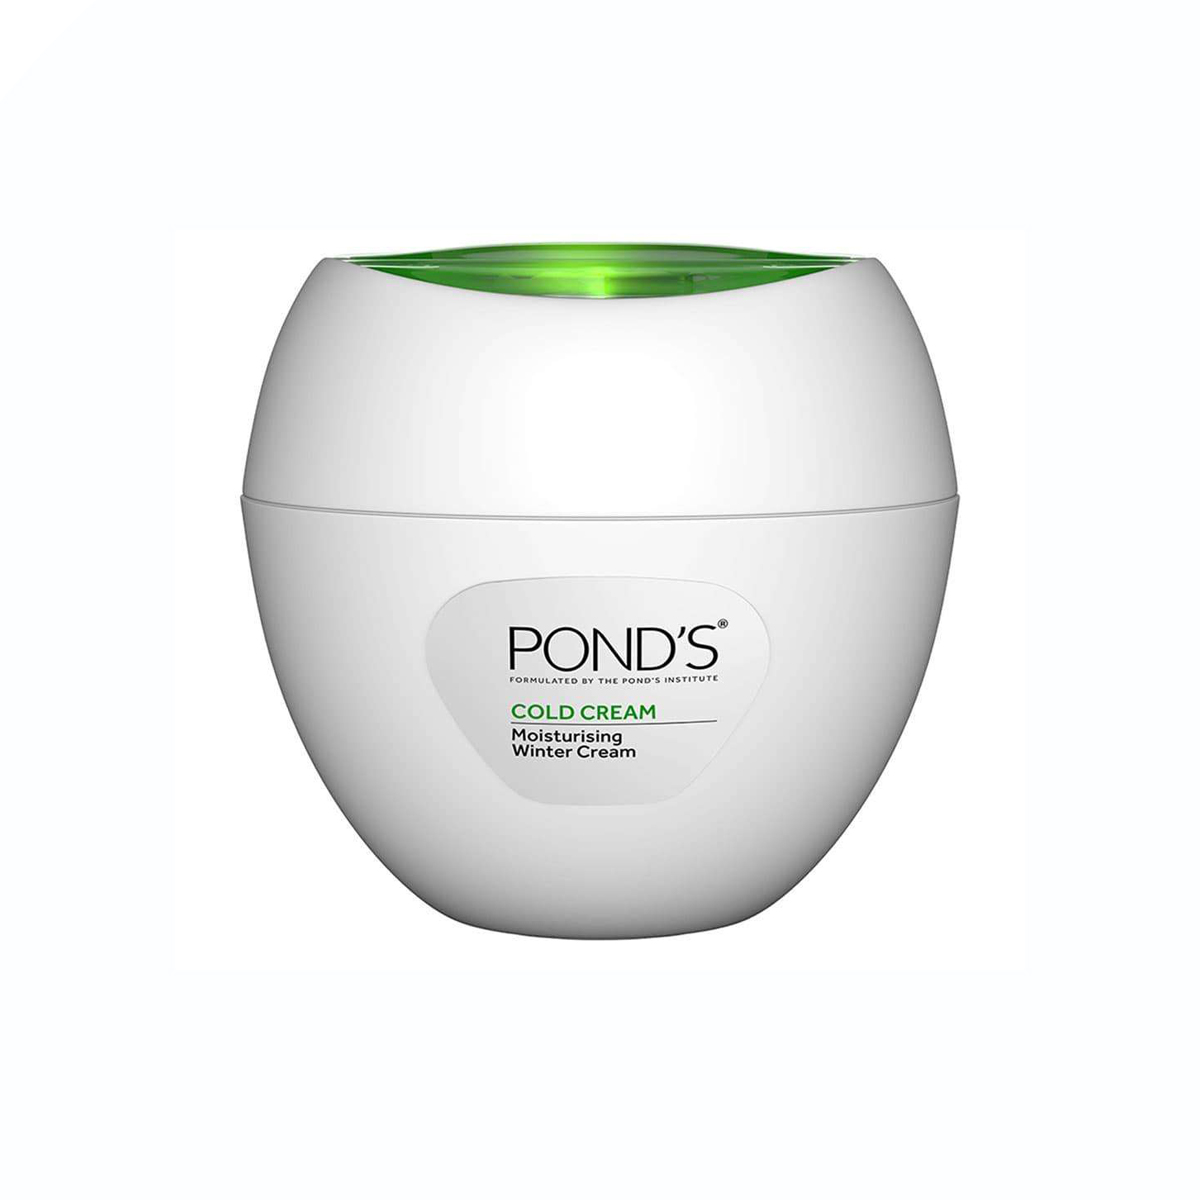 Ponds Moisturizing Cold Cream 28g